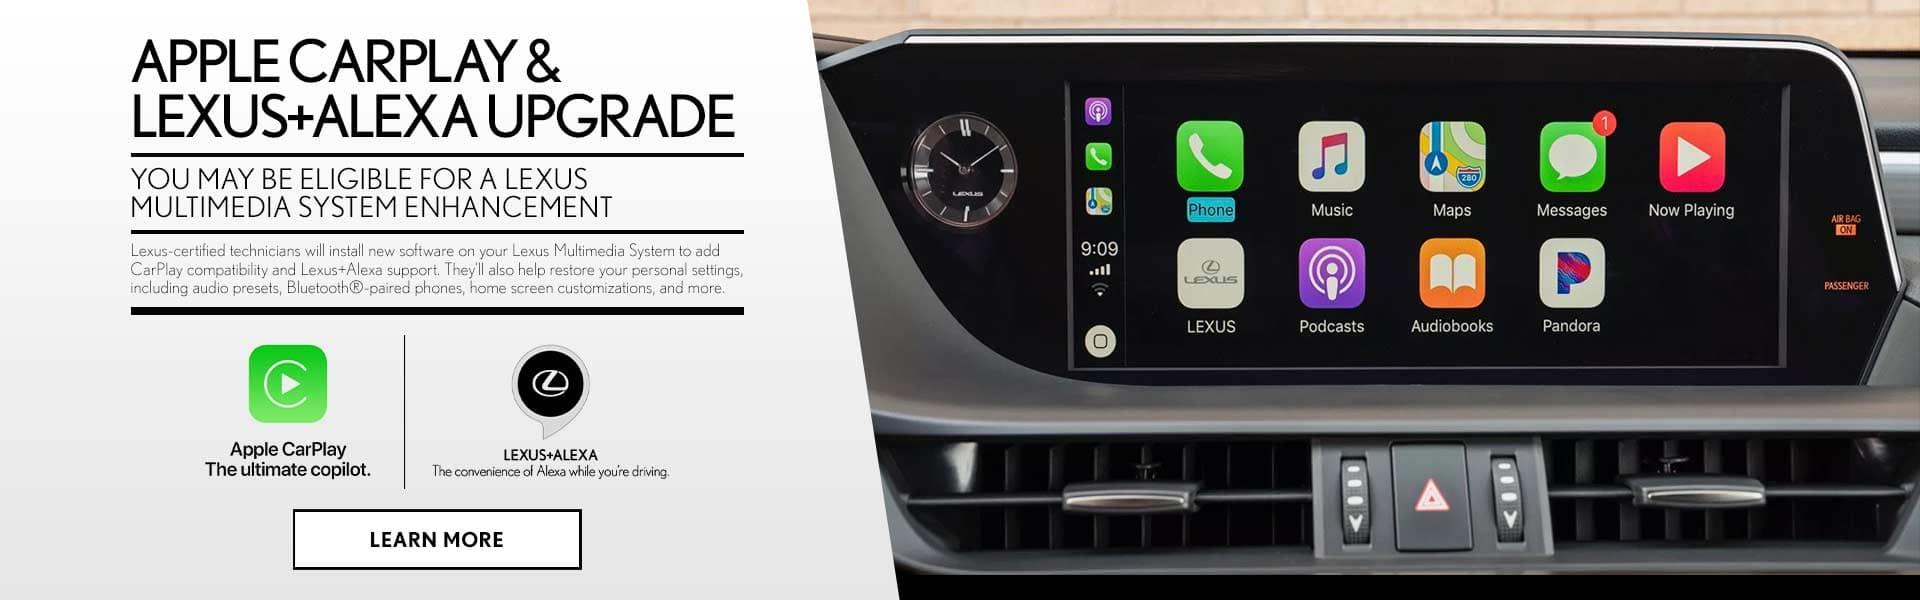 Lexus Apple Car Play and Alexa Upgrade